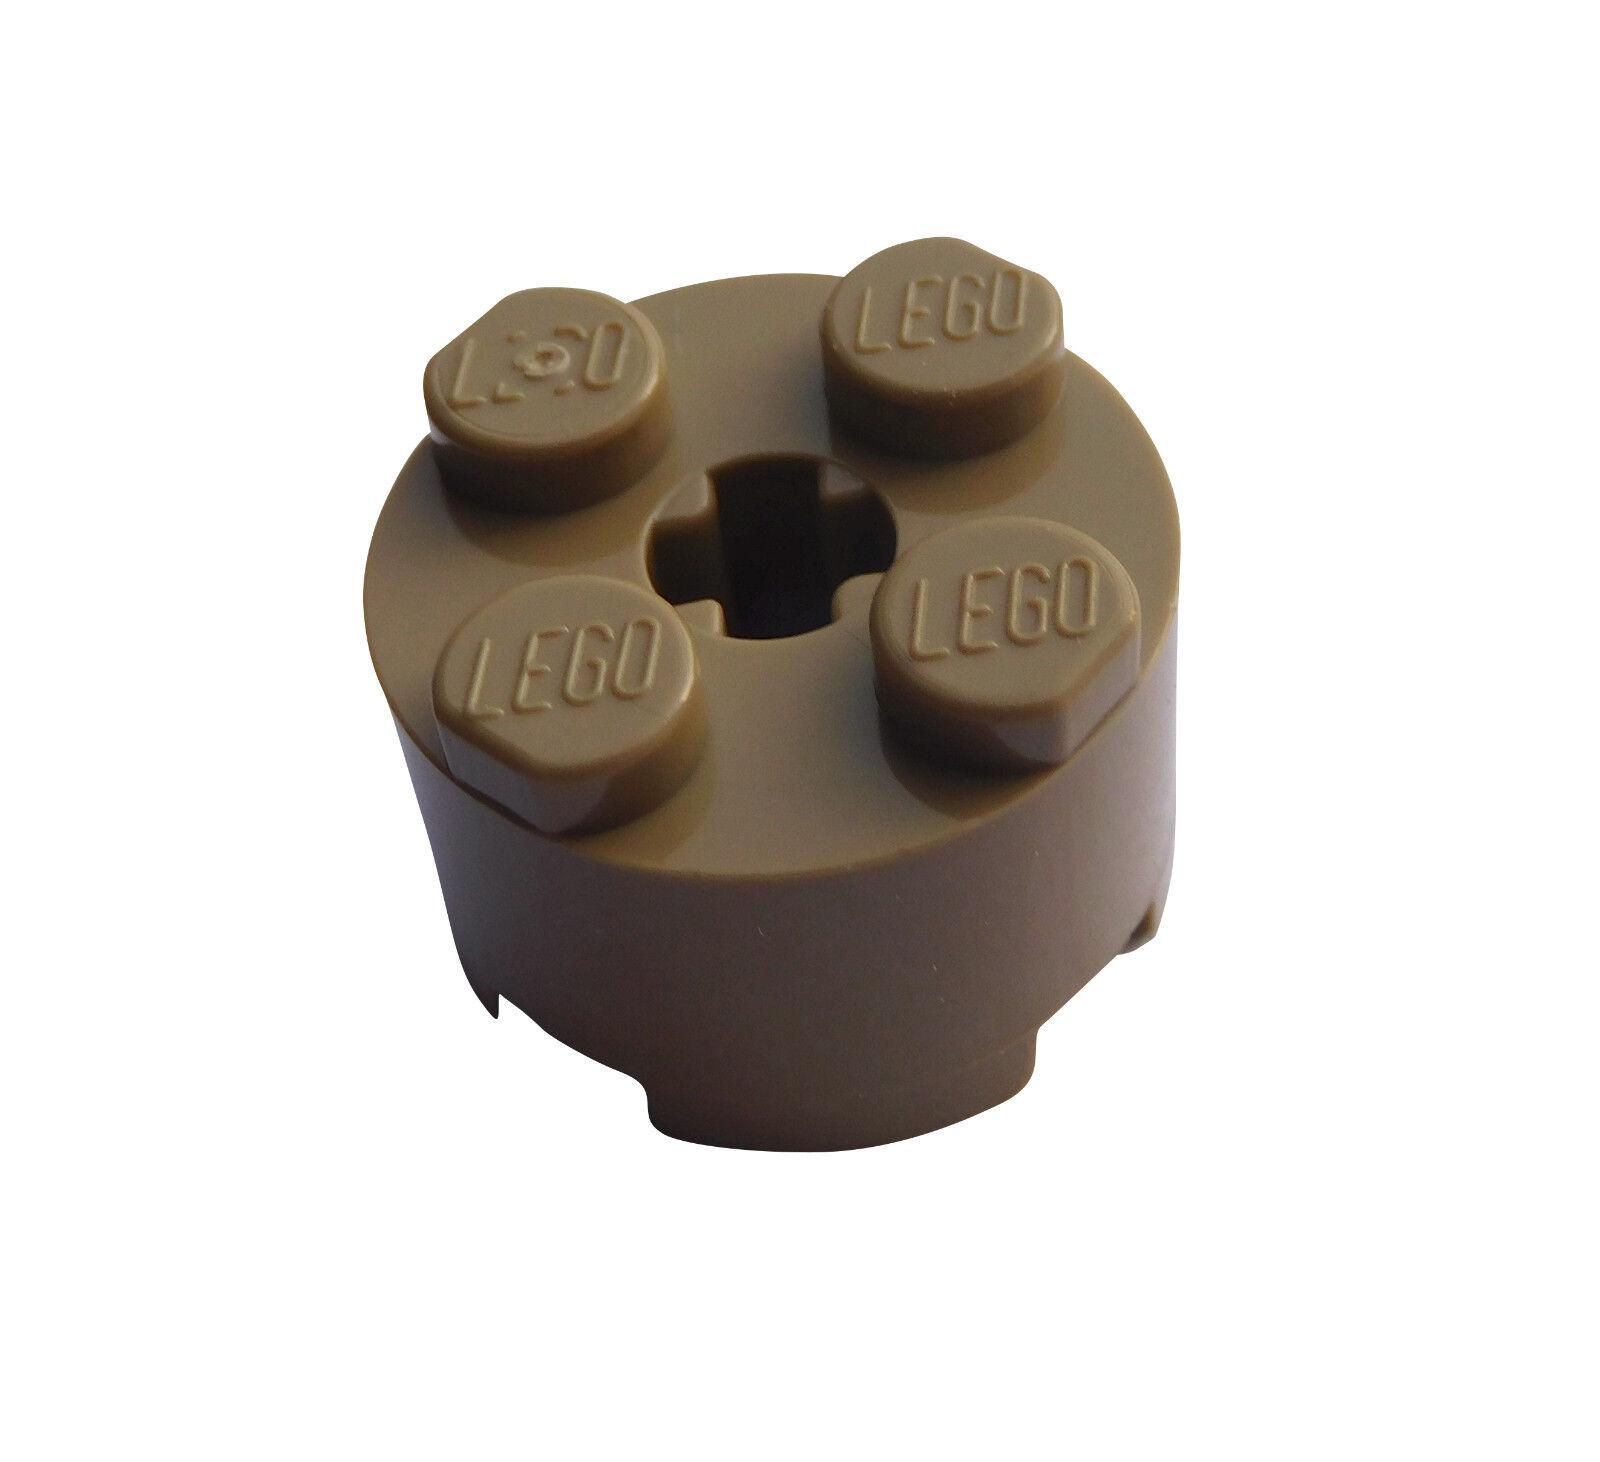 Lego 3941-4x Brique Ronde 6143 6116 39223 Neuf Tr Orange Brick Round 2x2